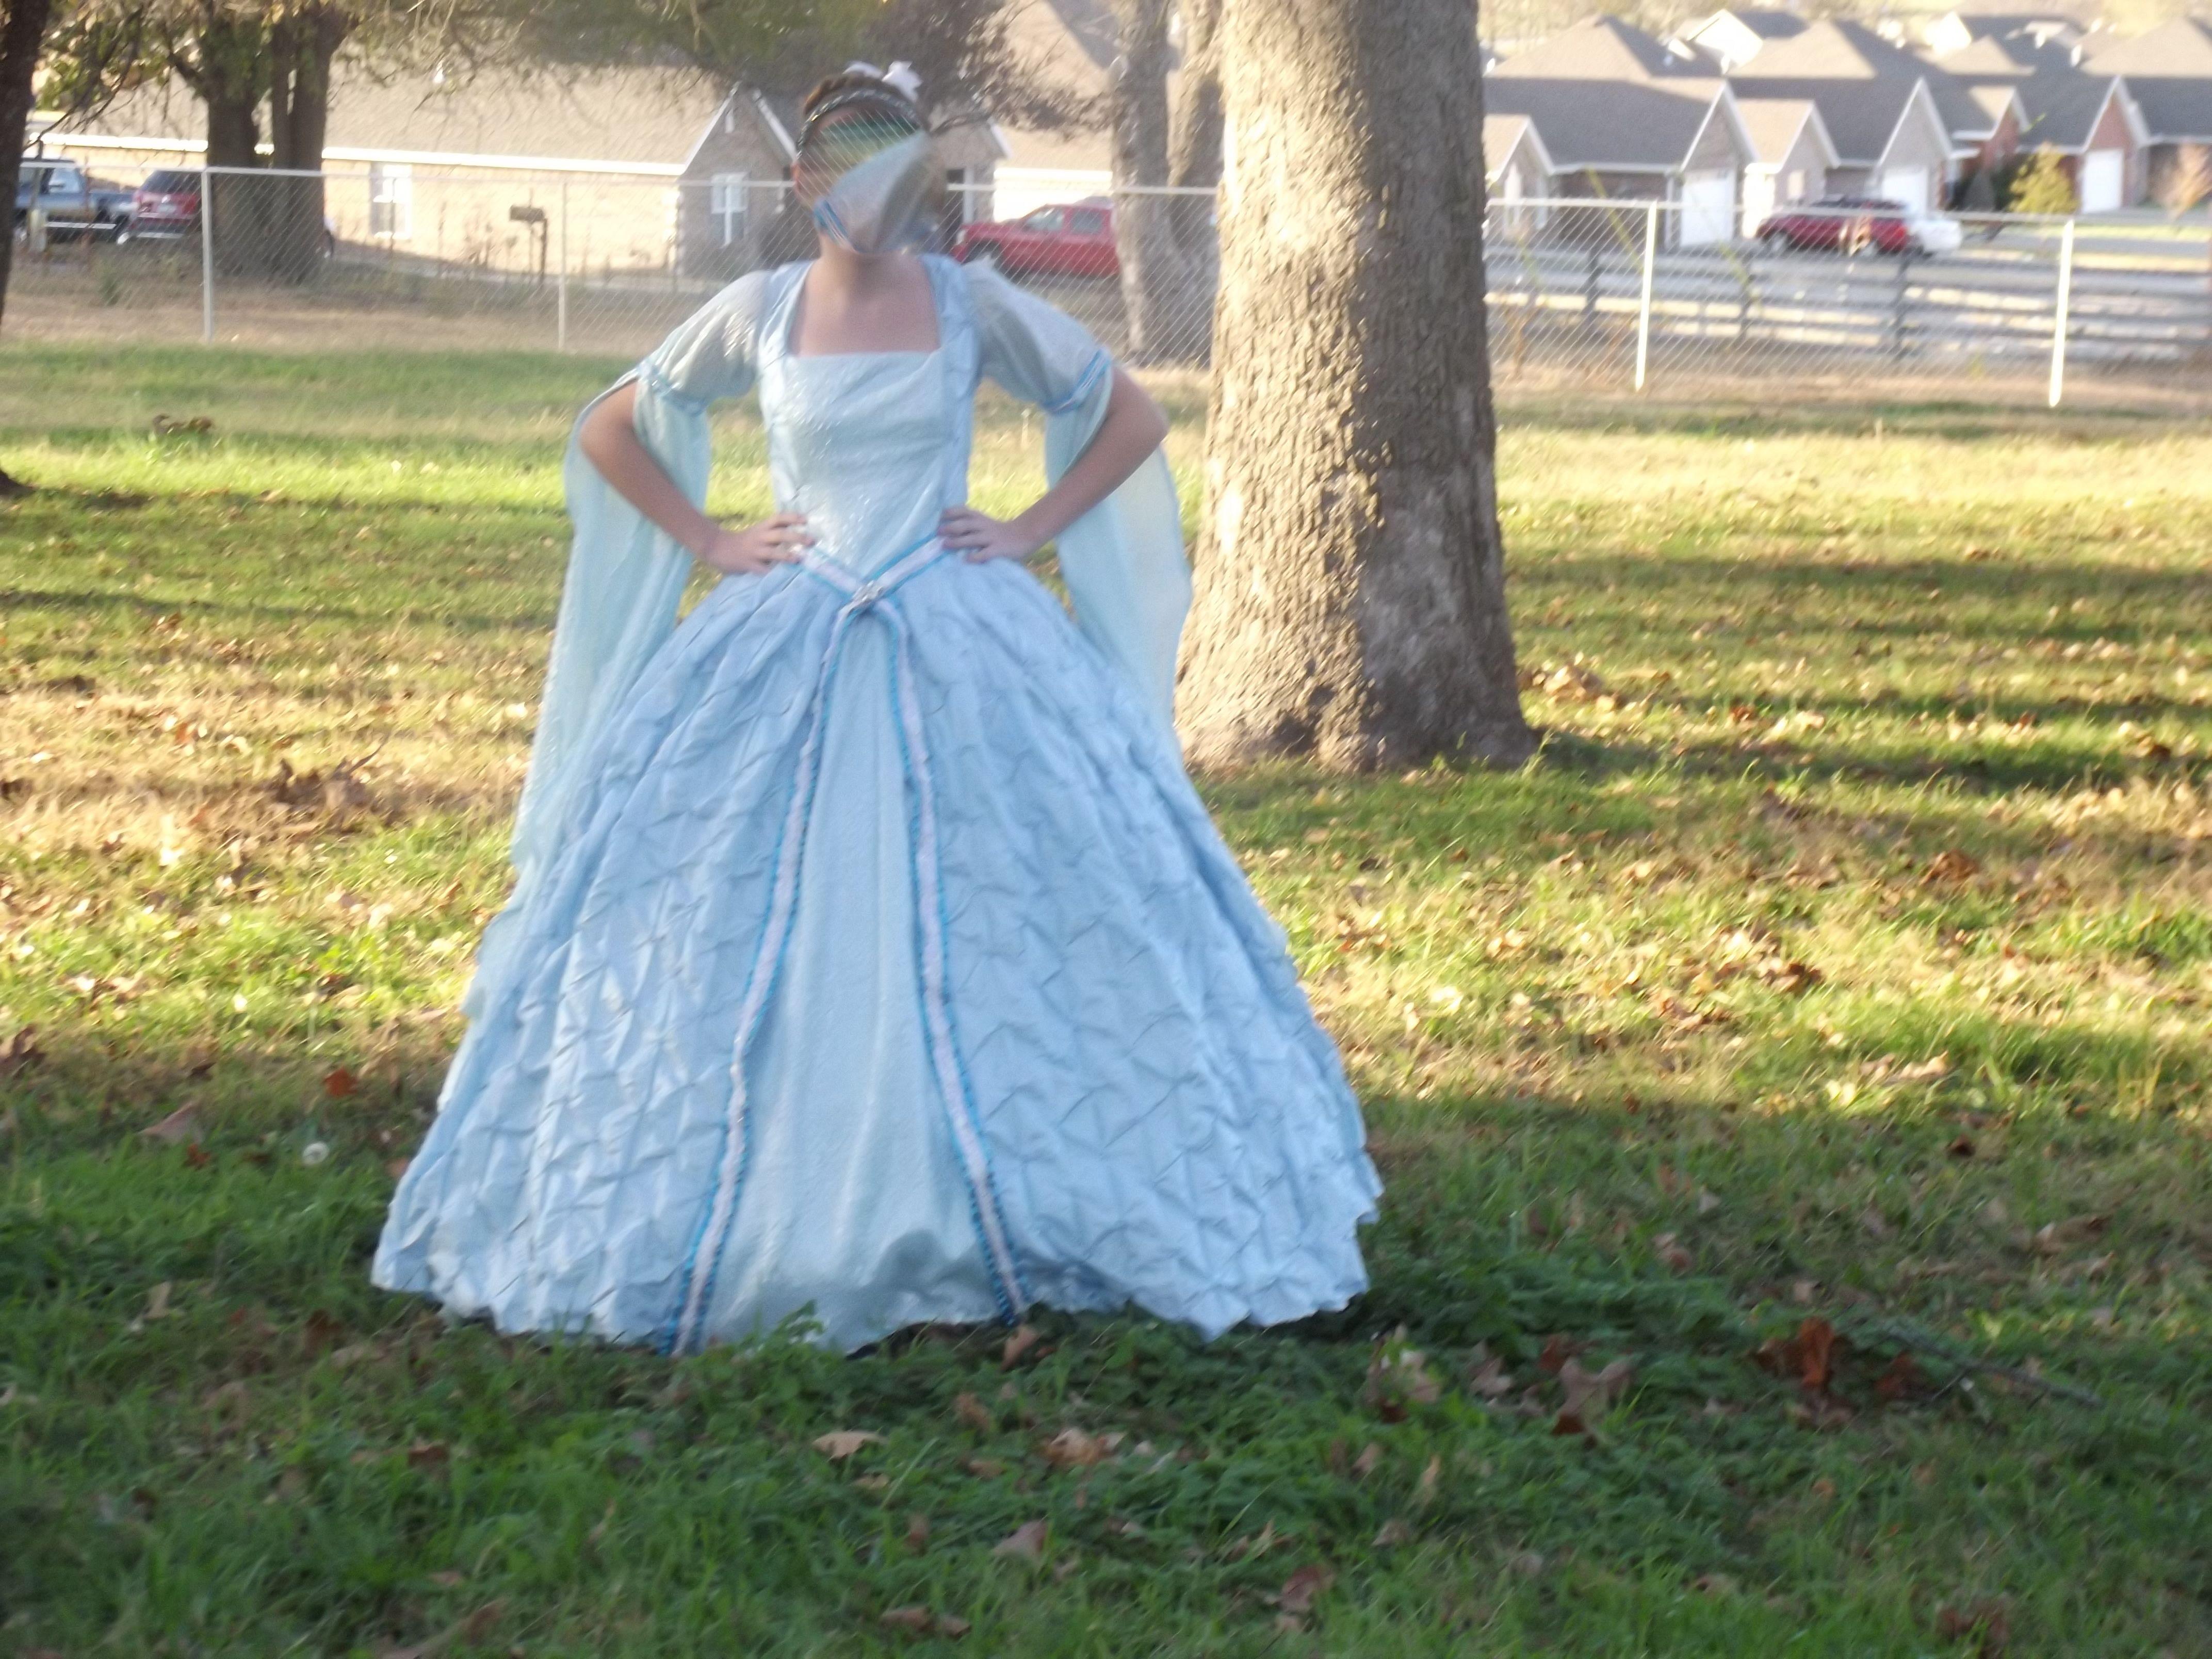 Renaissance Ball Gown | RENAISSANCE CLOTHING! | Pinterest ...